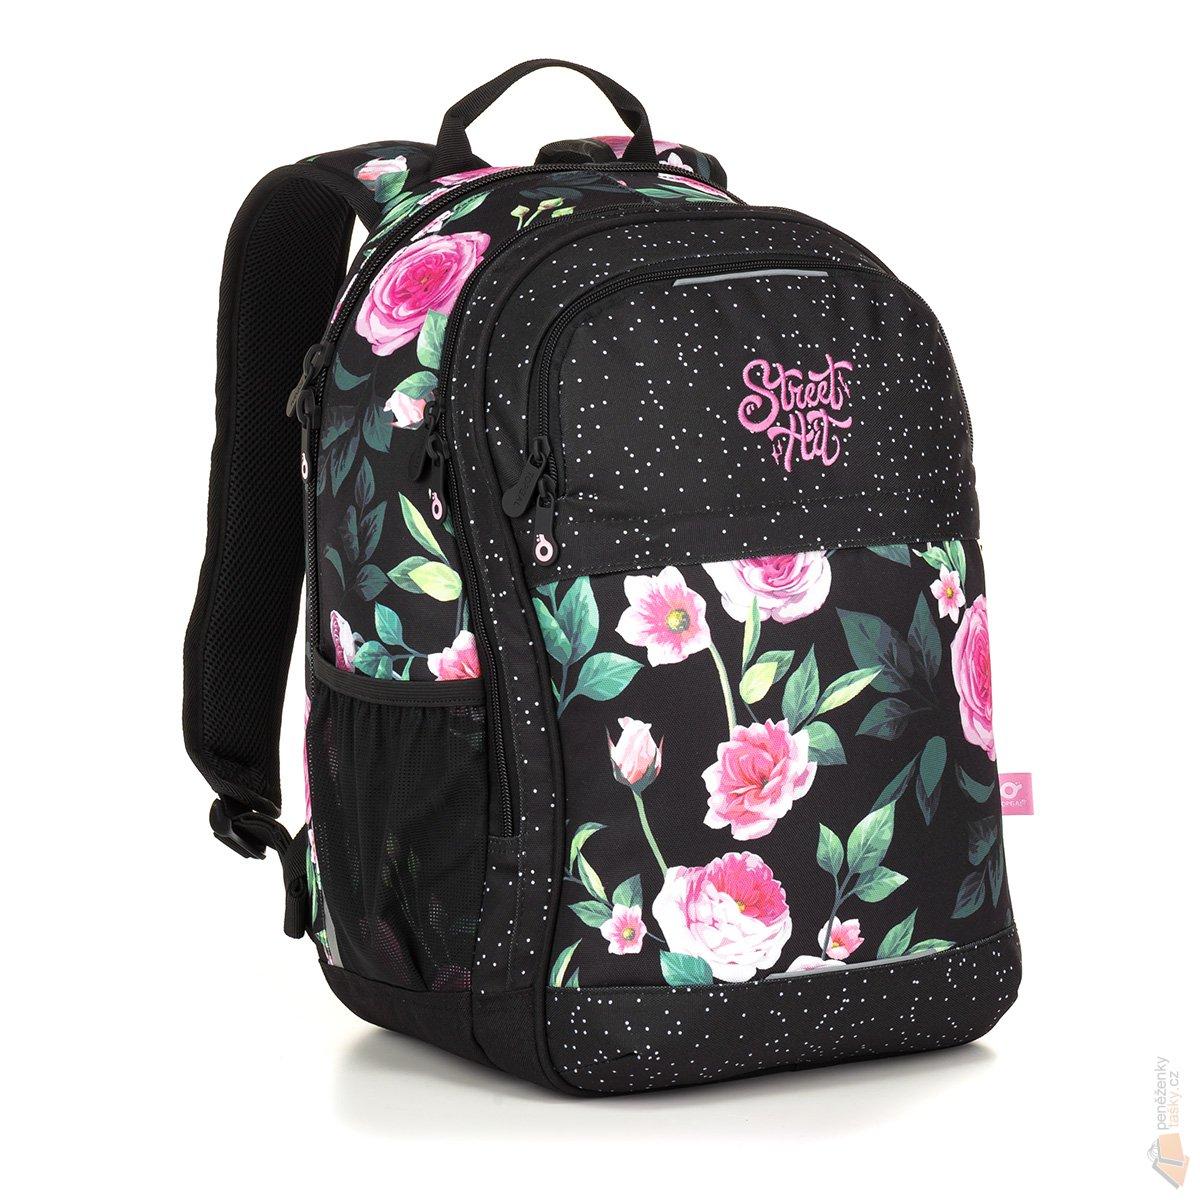 Topgal Studentský batoh RUBI 18025 G   Kabelky 9a432afdff